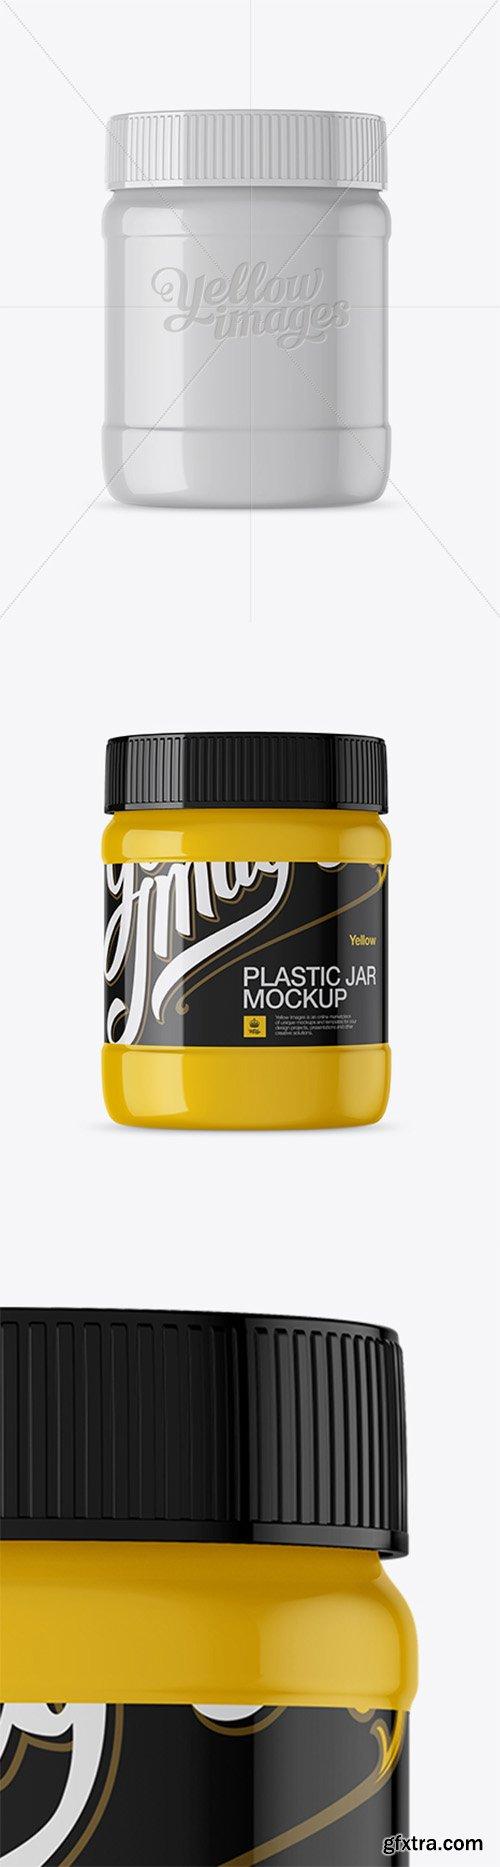 Glossy Plastic Jar Mockup - Front View 14142